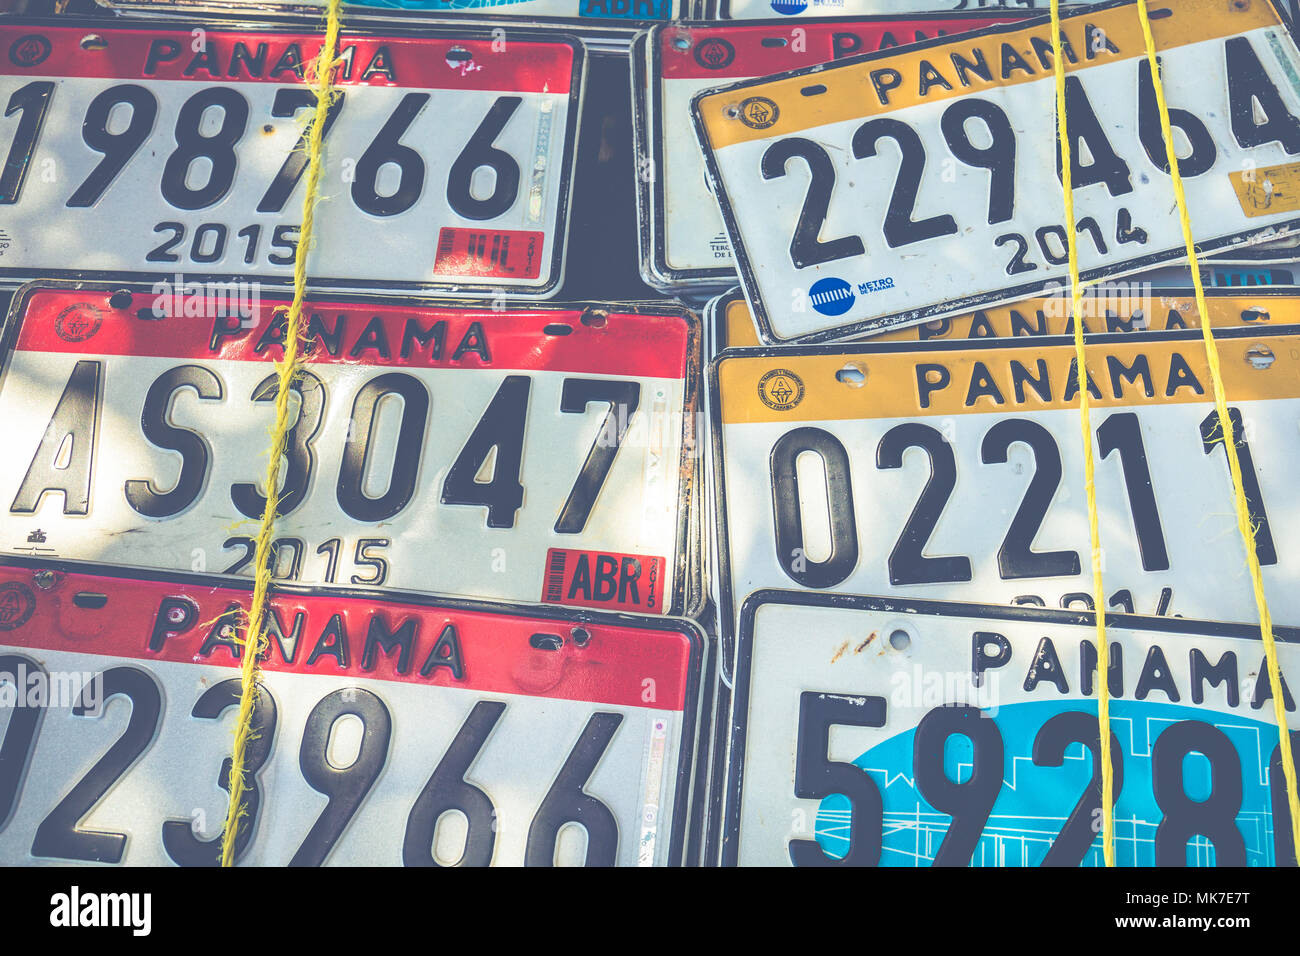 Panama vehicle registration plates Stock Photo: 183947004 - Alamy